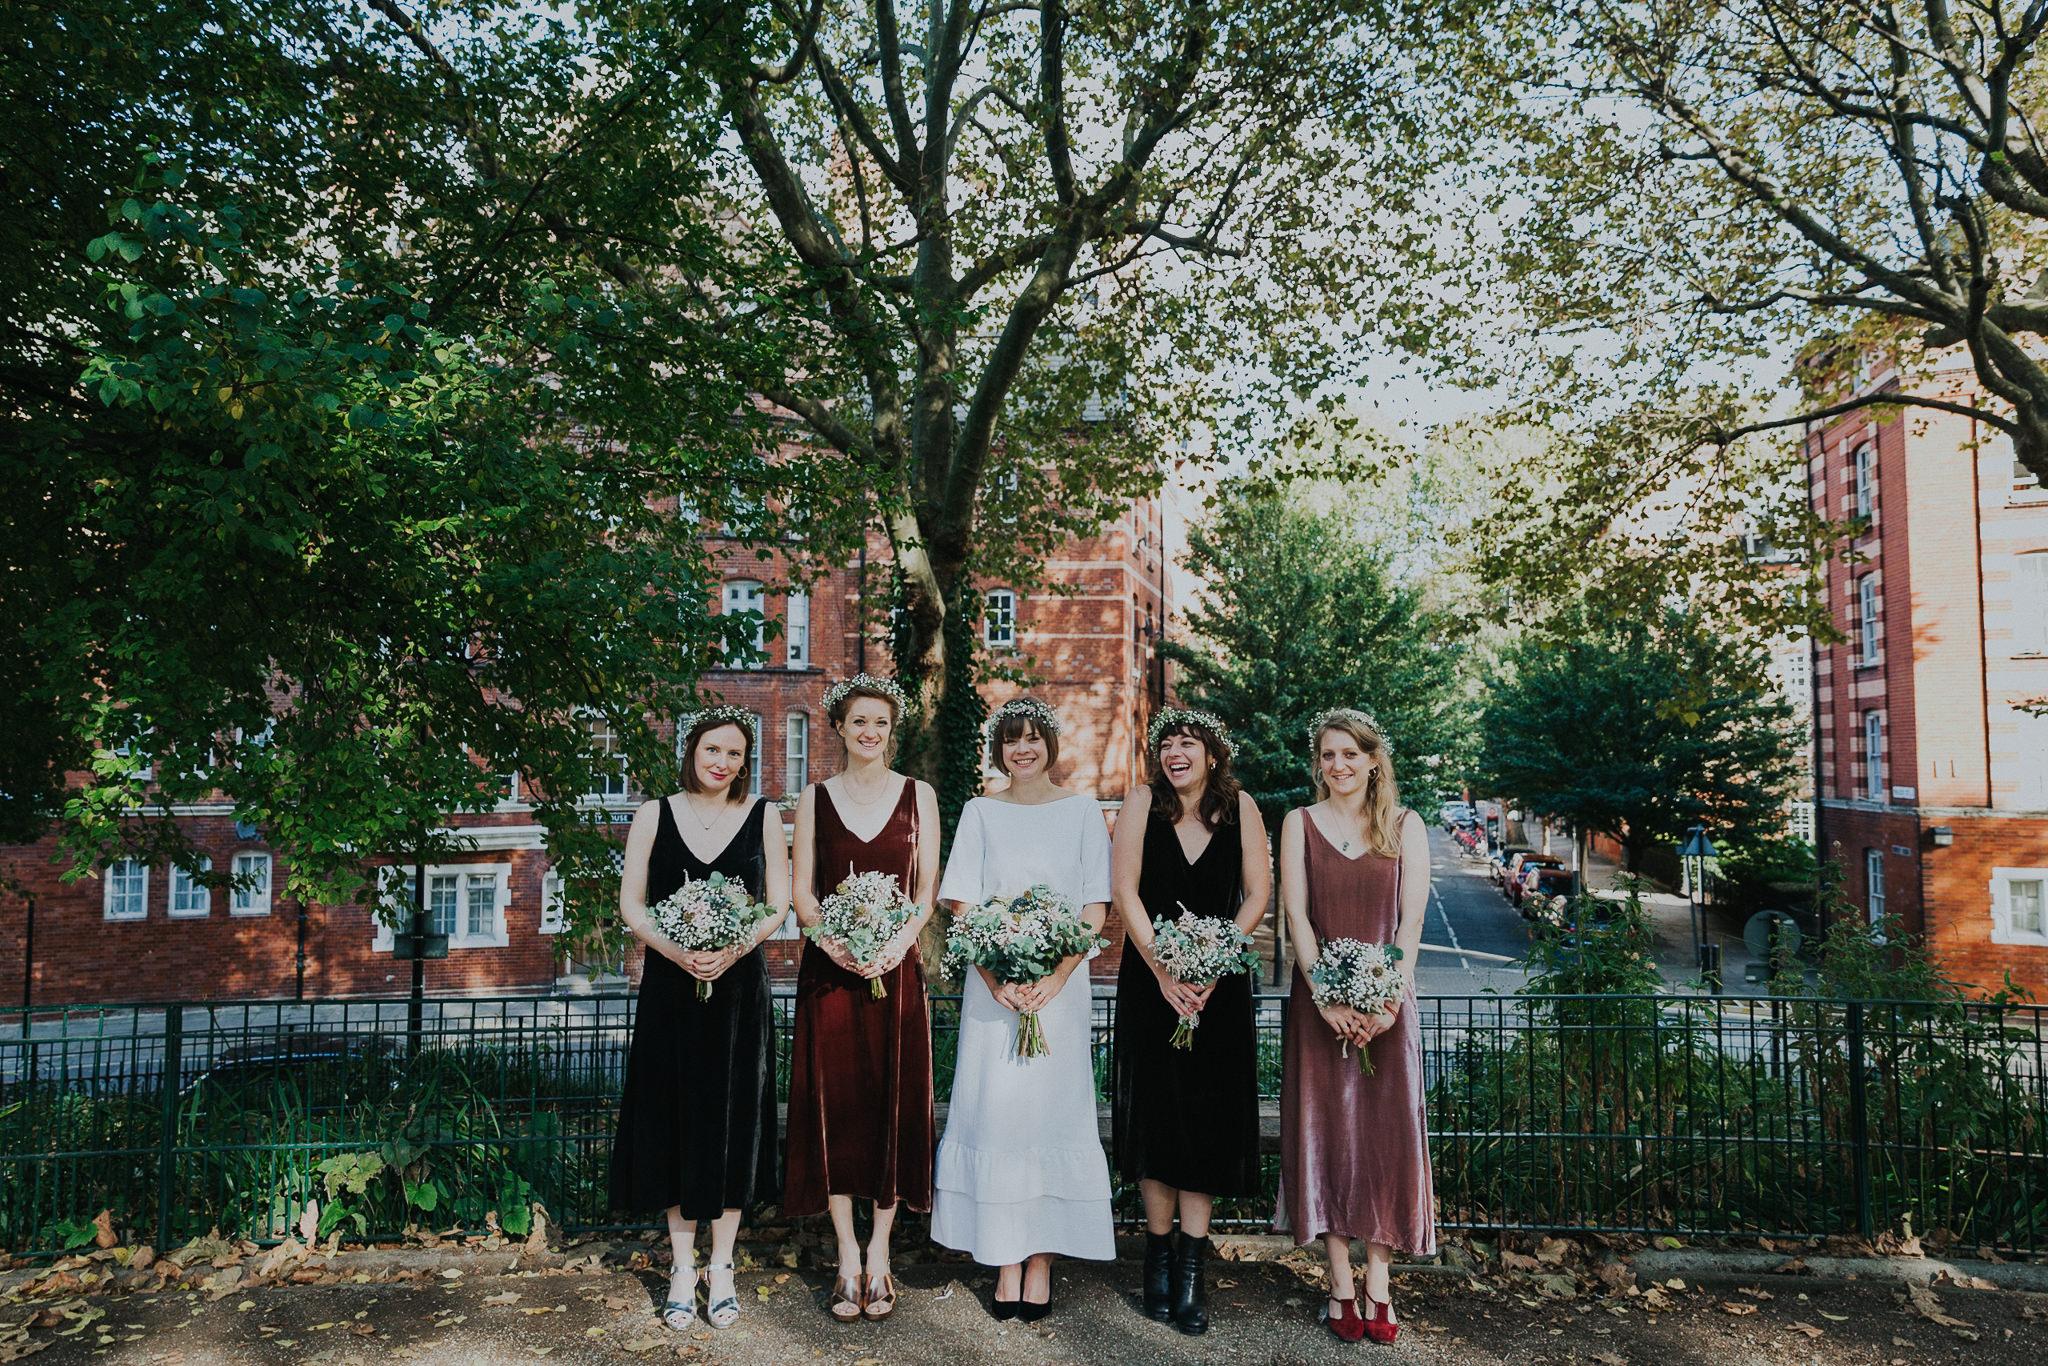 kate-gray-london-wedding-photography-48.jpg